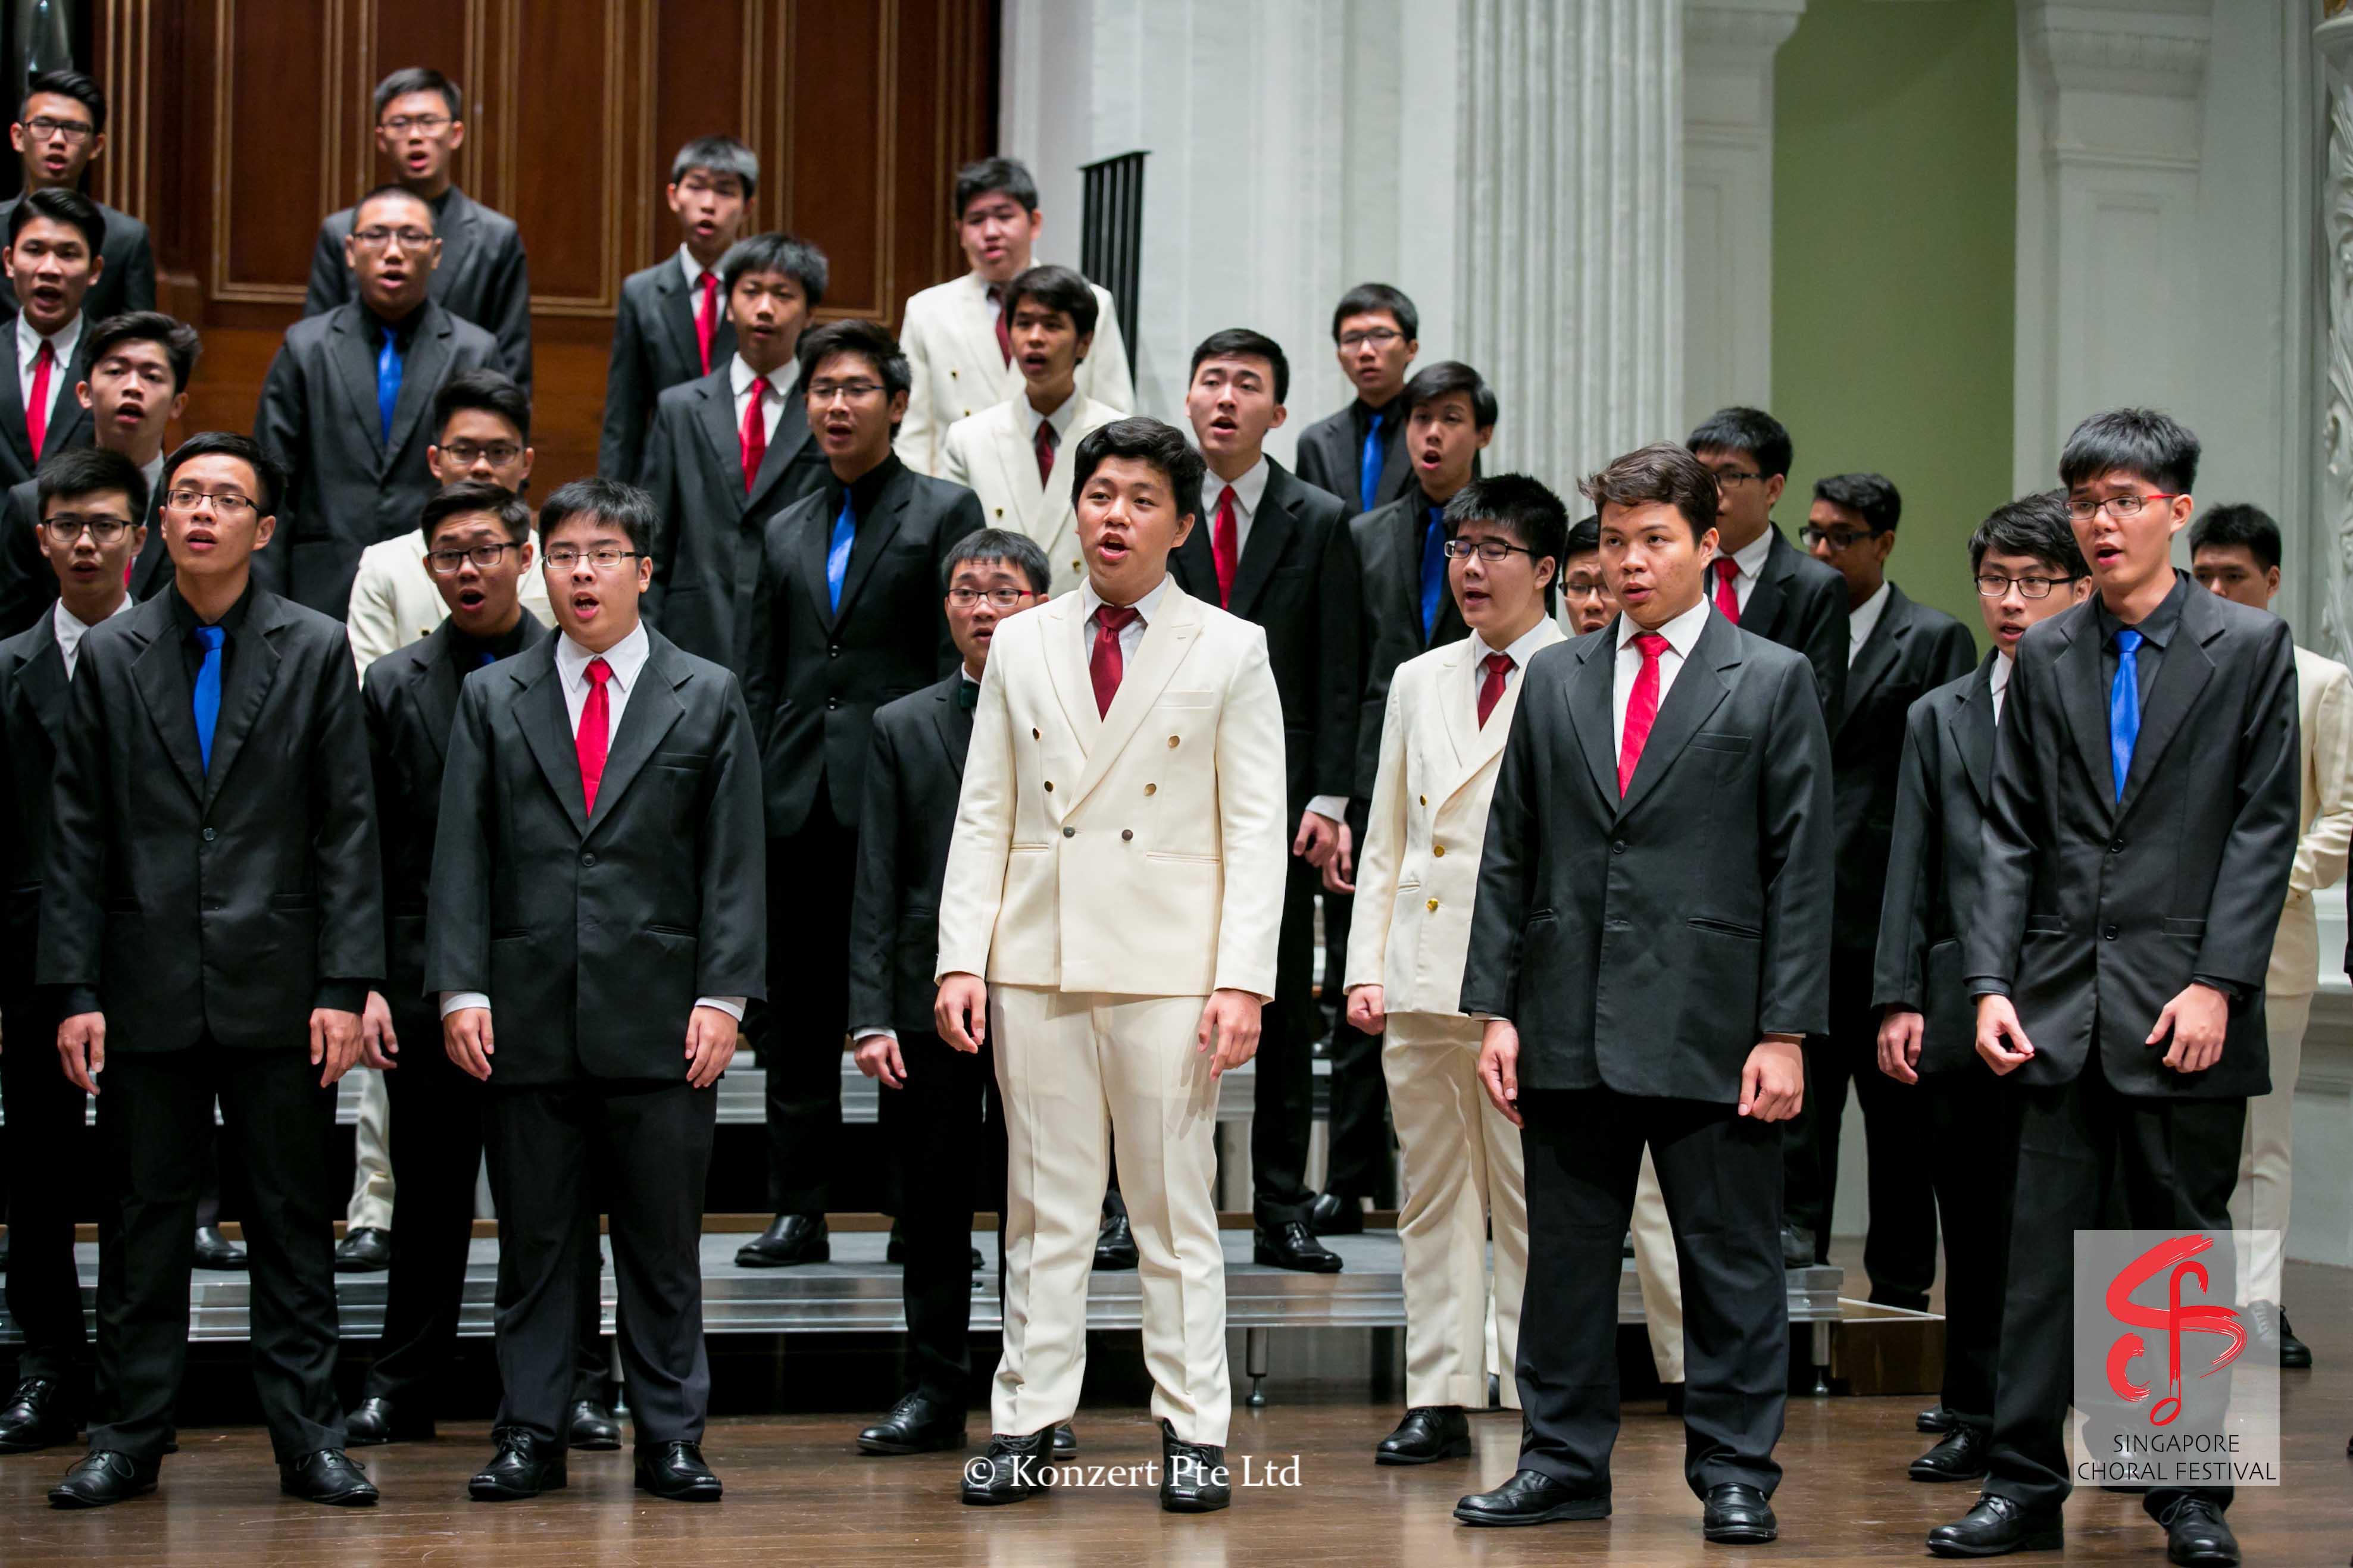 Singapore Choral Festival 7-8-15 (140).jpg